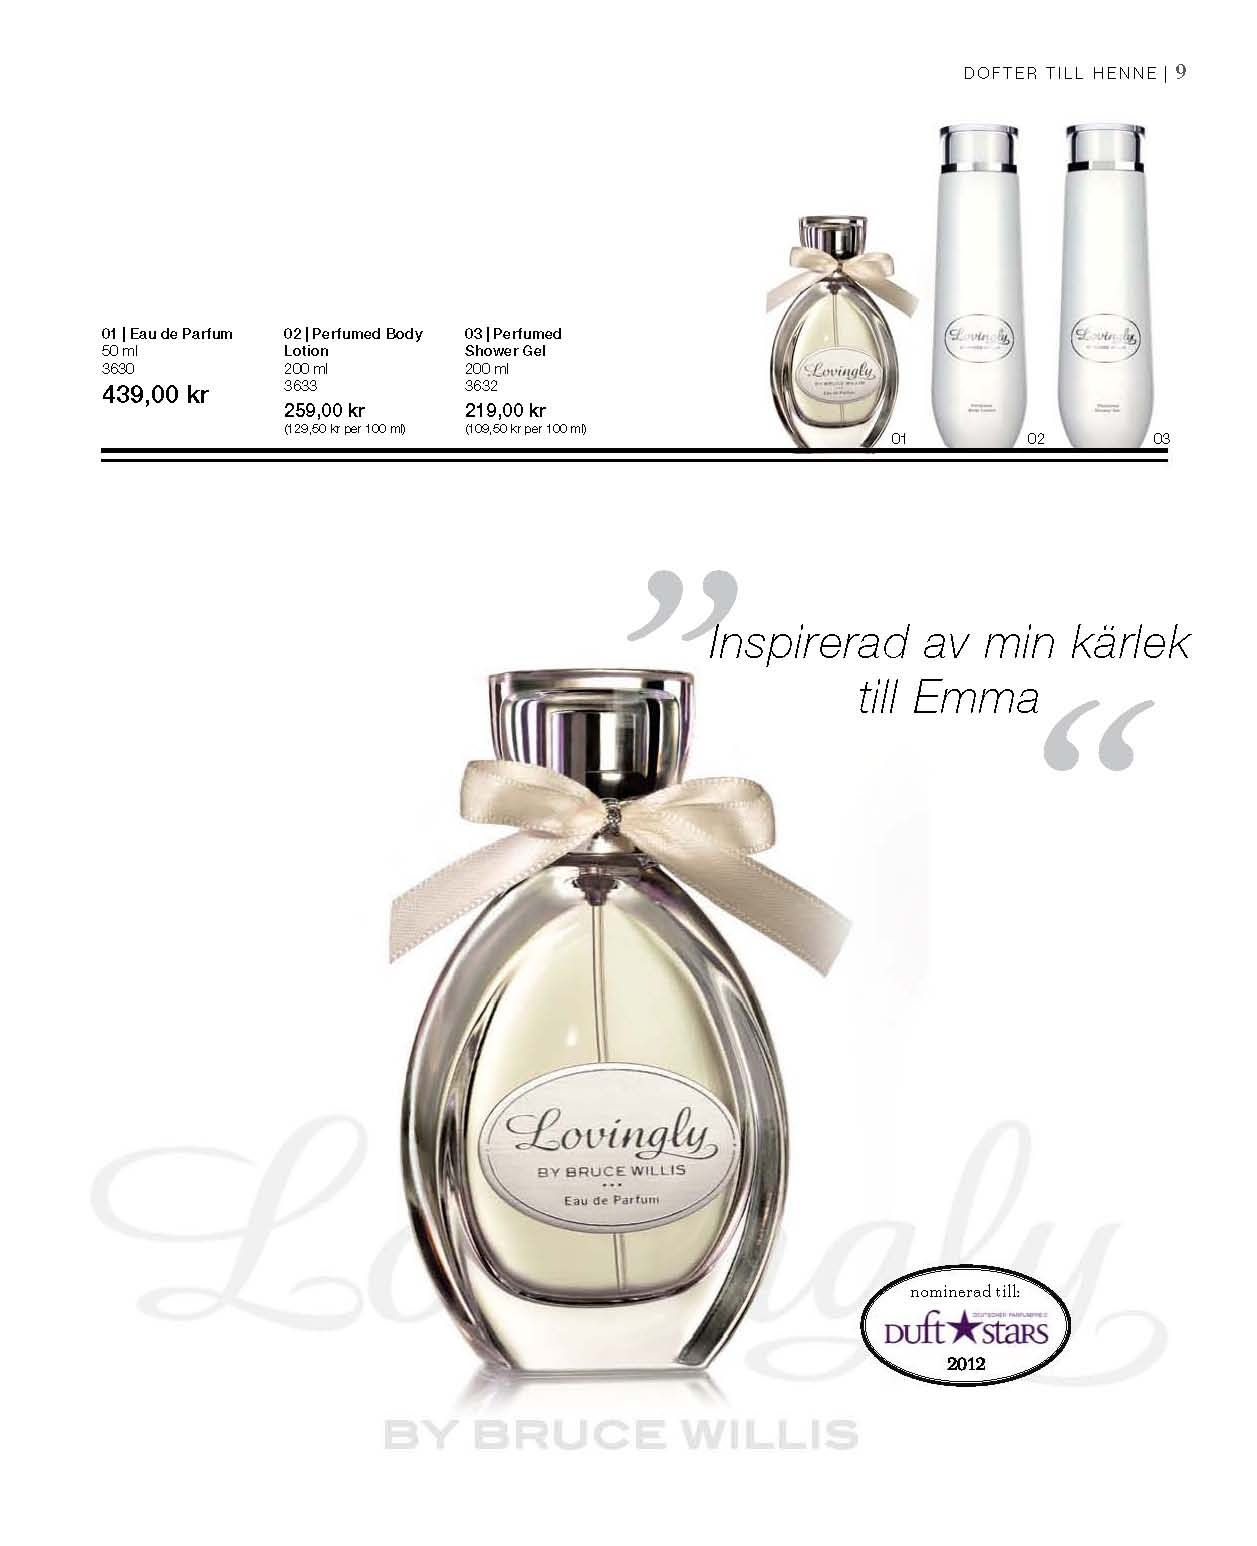 Lovingly by Bruce Willis Eau de Parfum | aloeveraskonhet.se